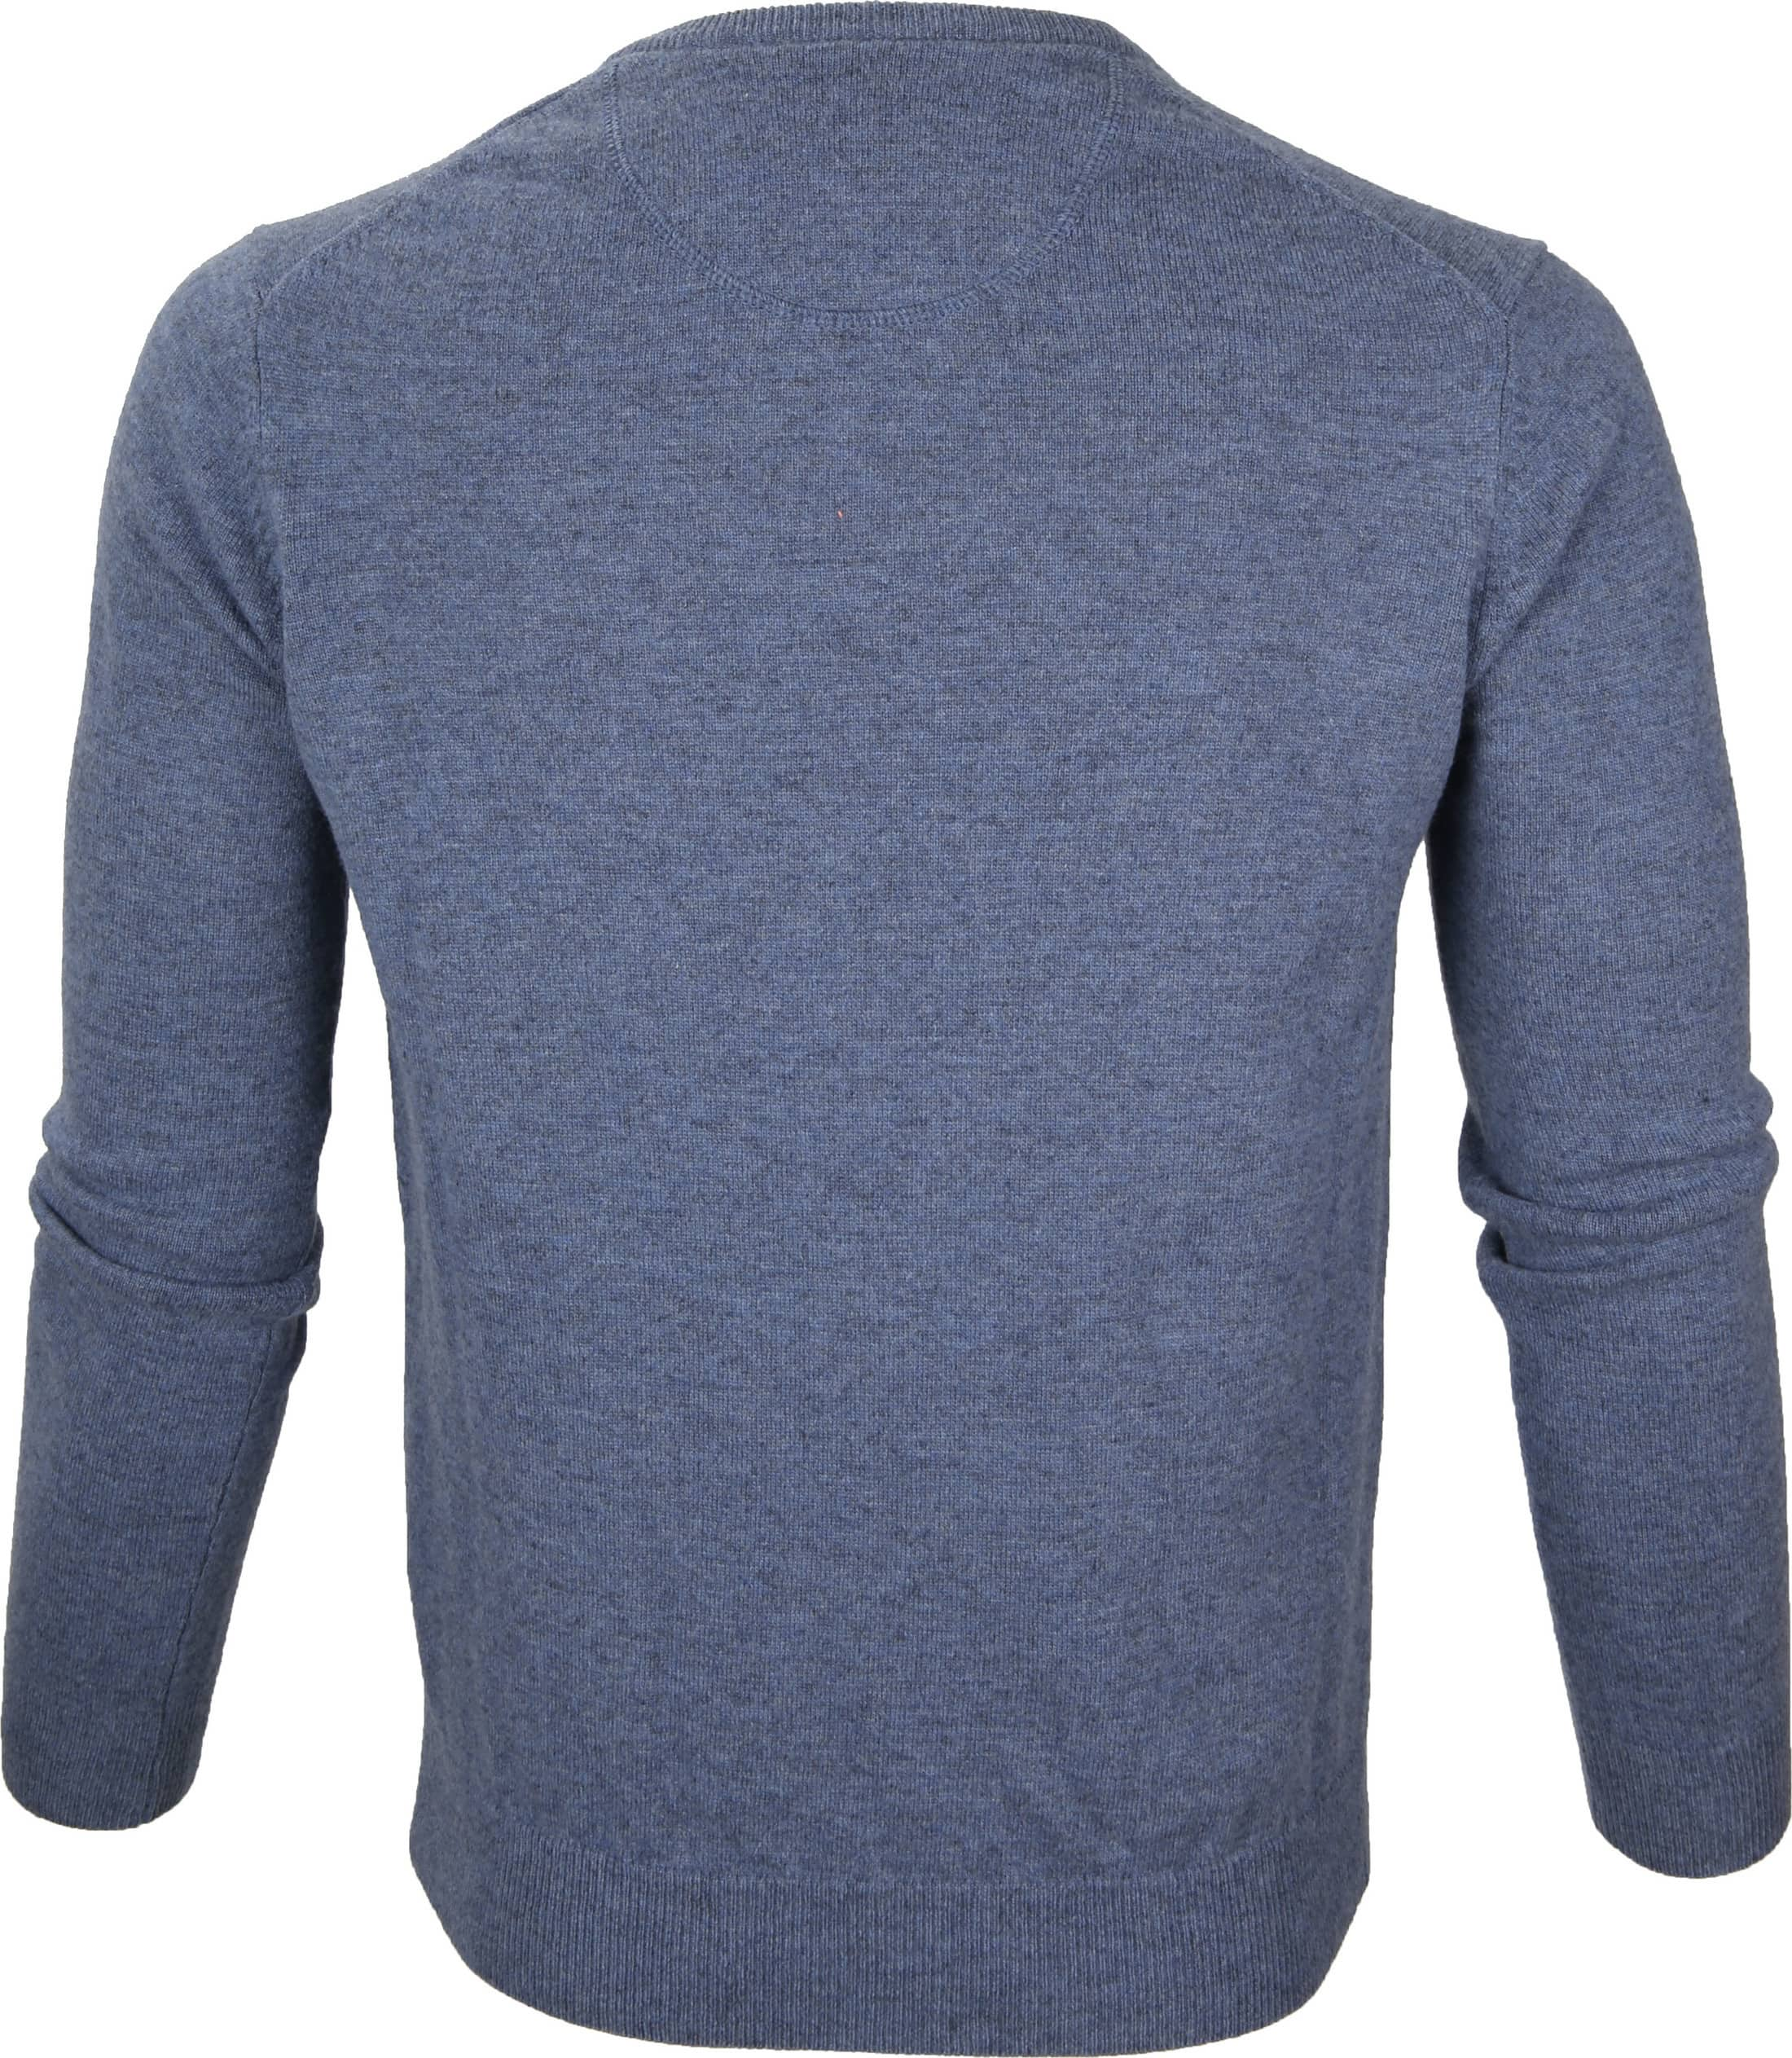 Suitable Pullover Lammwolle V-Ausschnitt Hellblau foto 2